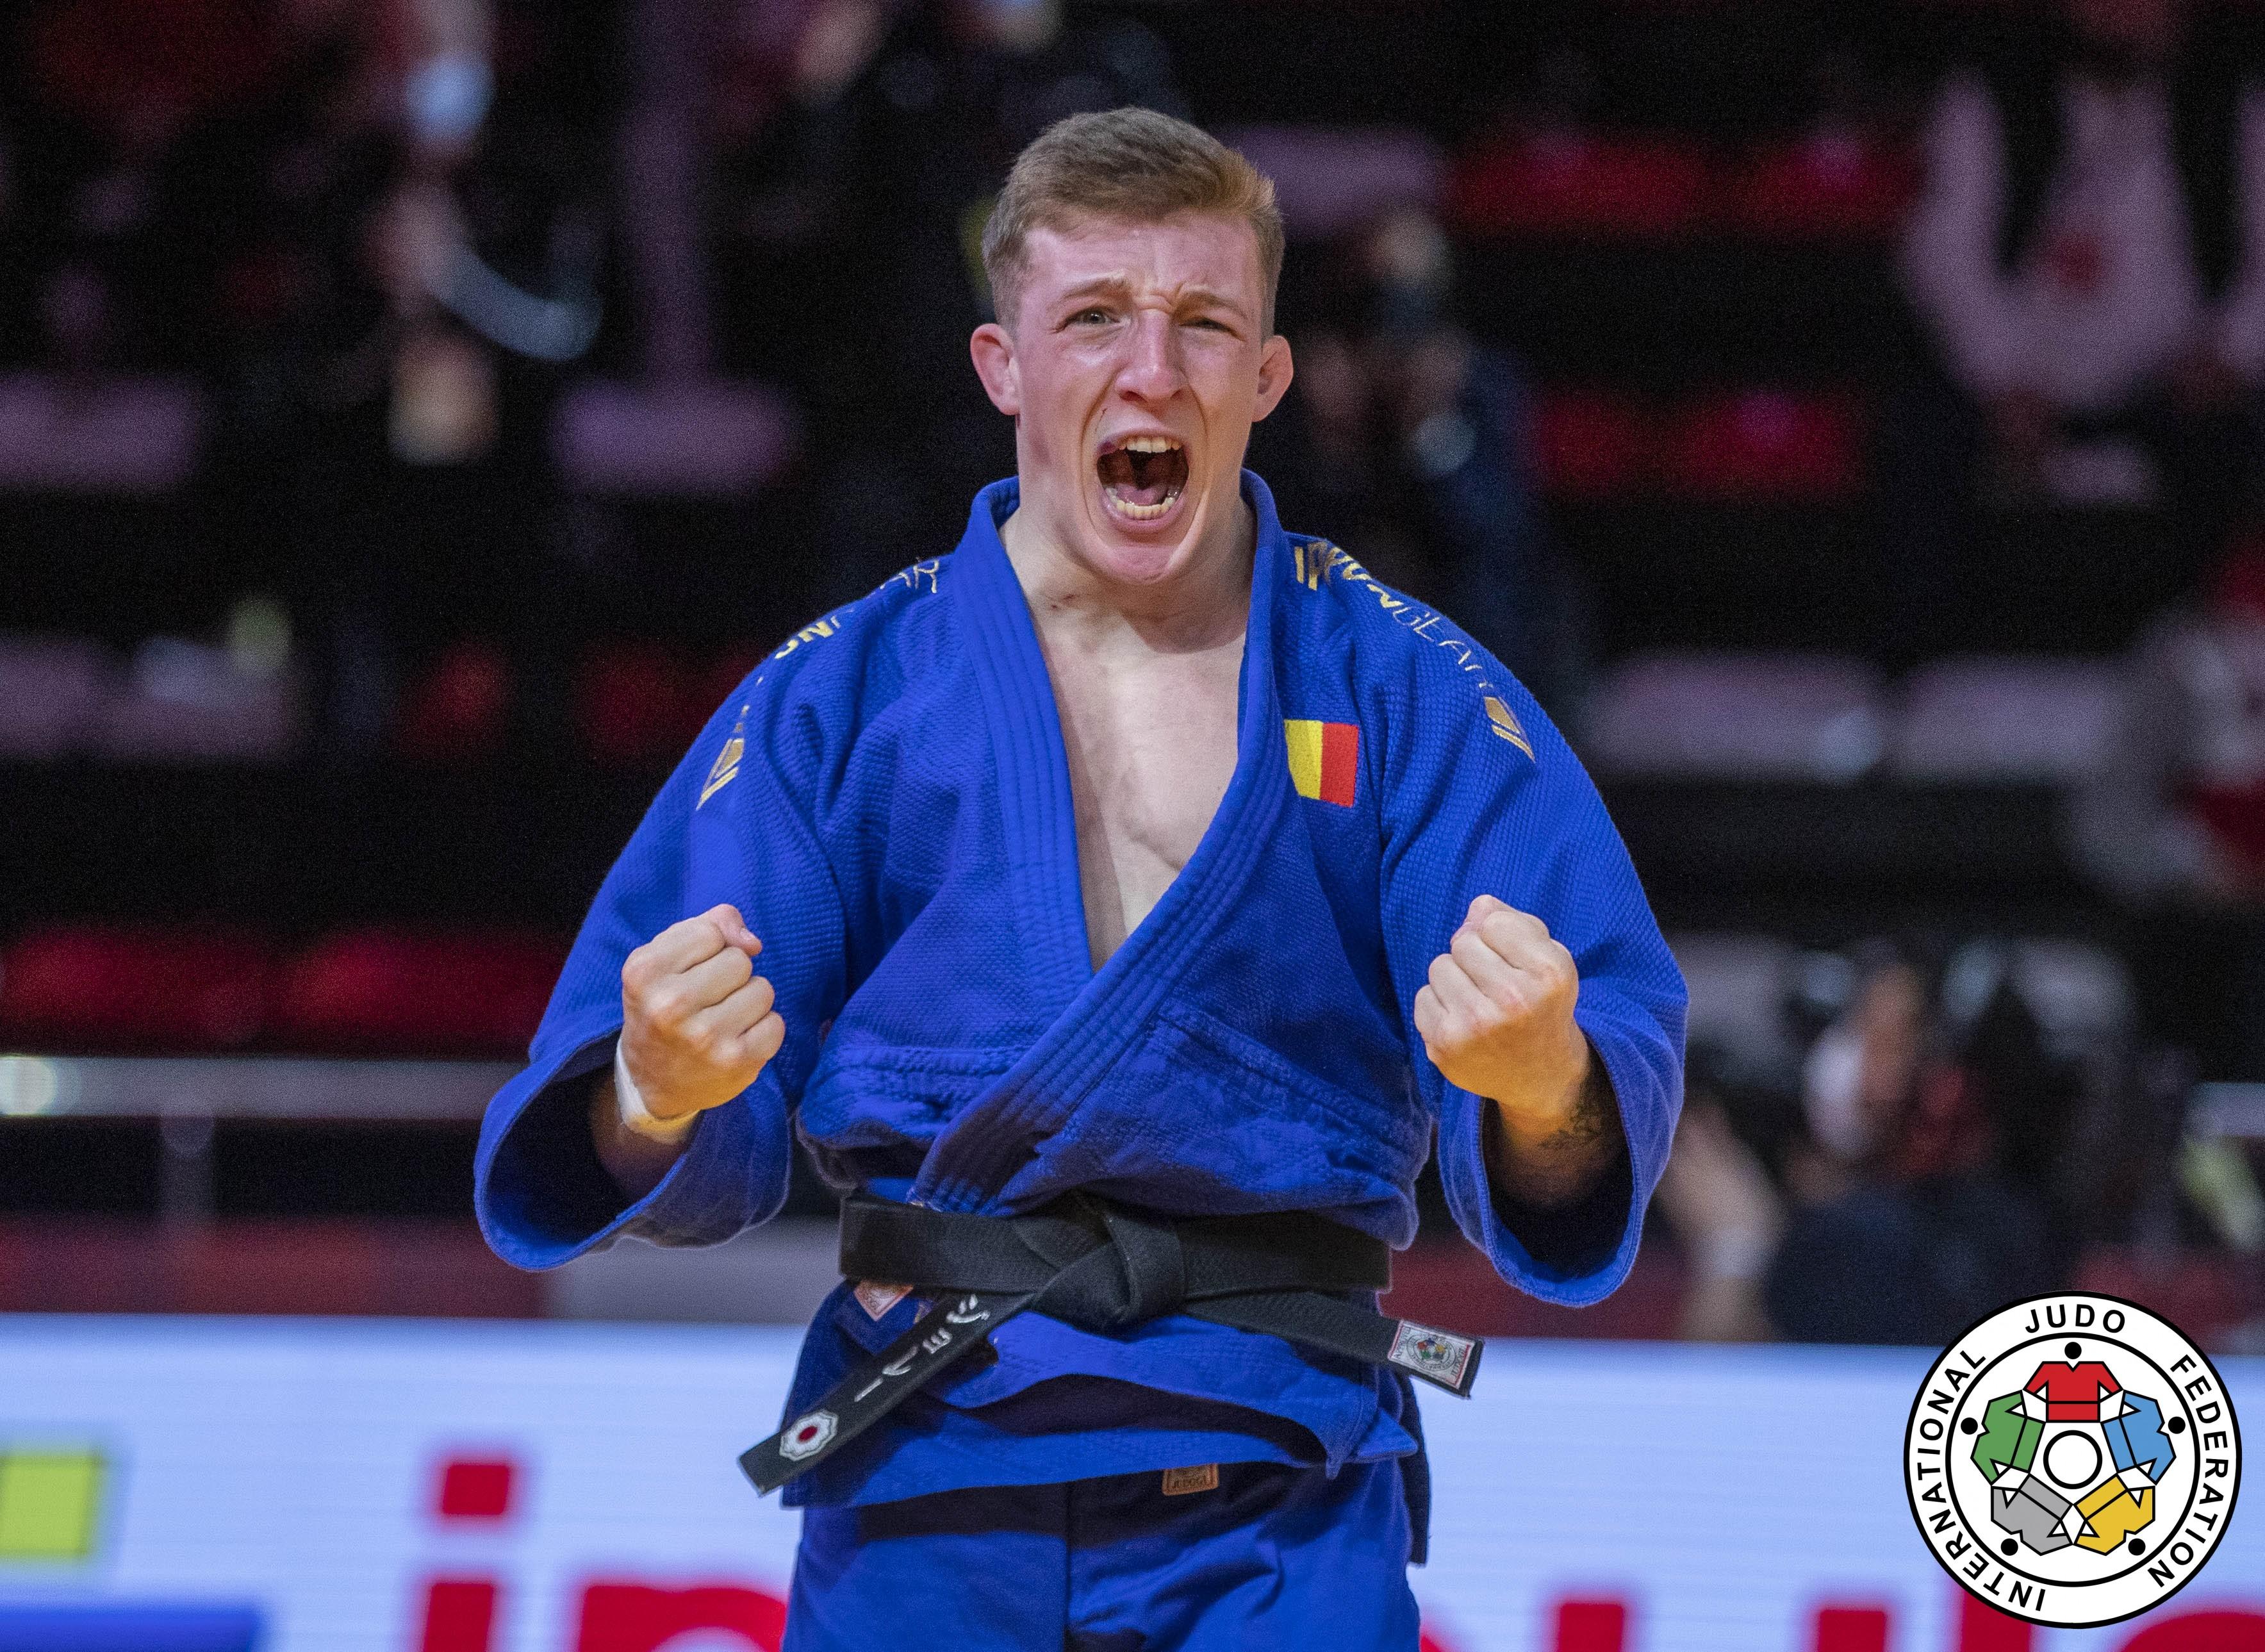 Judo-IJF-World-Tour-2021-Grand-slam-Antalya-Turkey-Jorre-Verstraeten-Belgium-60-kg-2